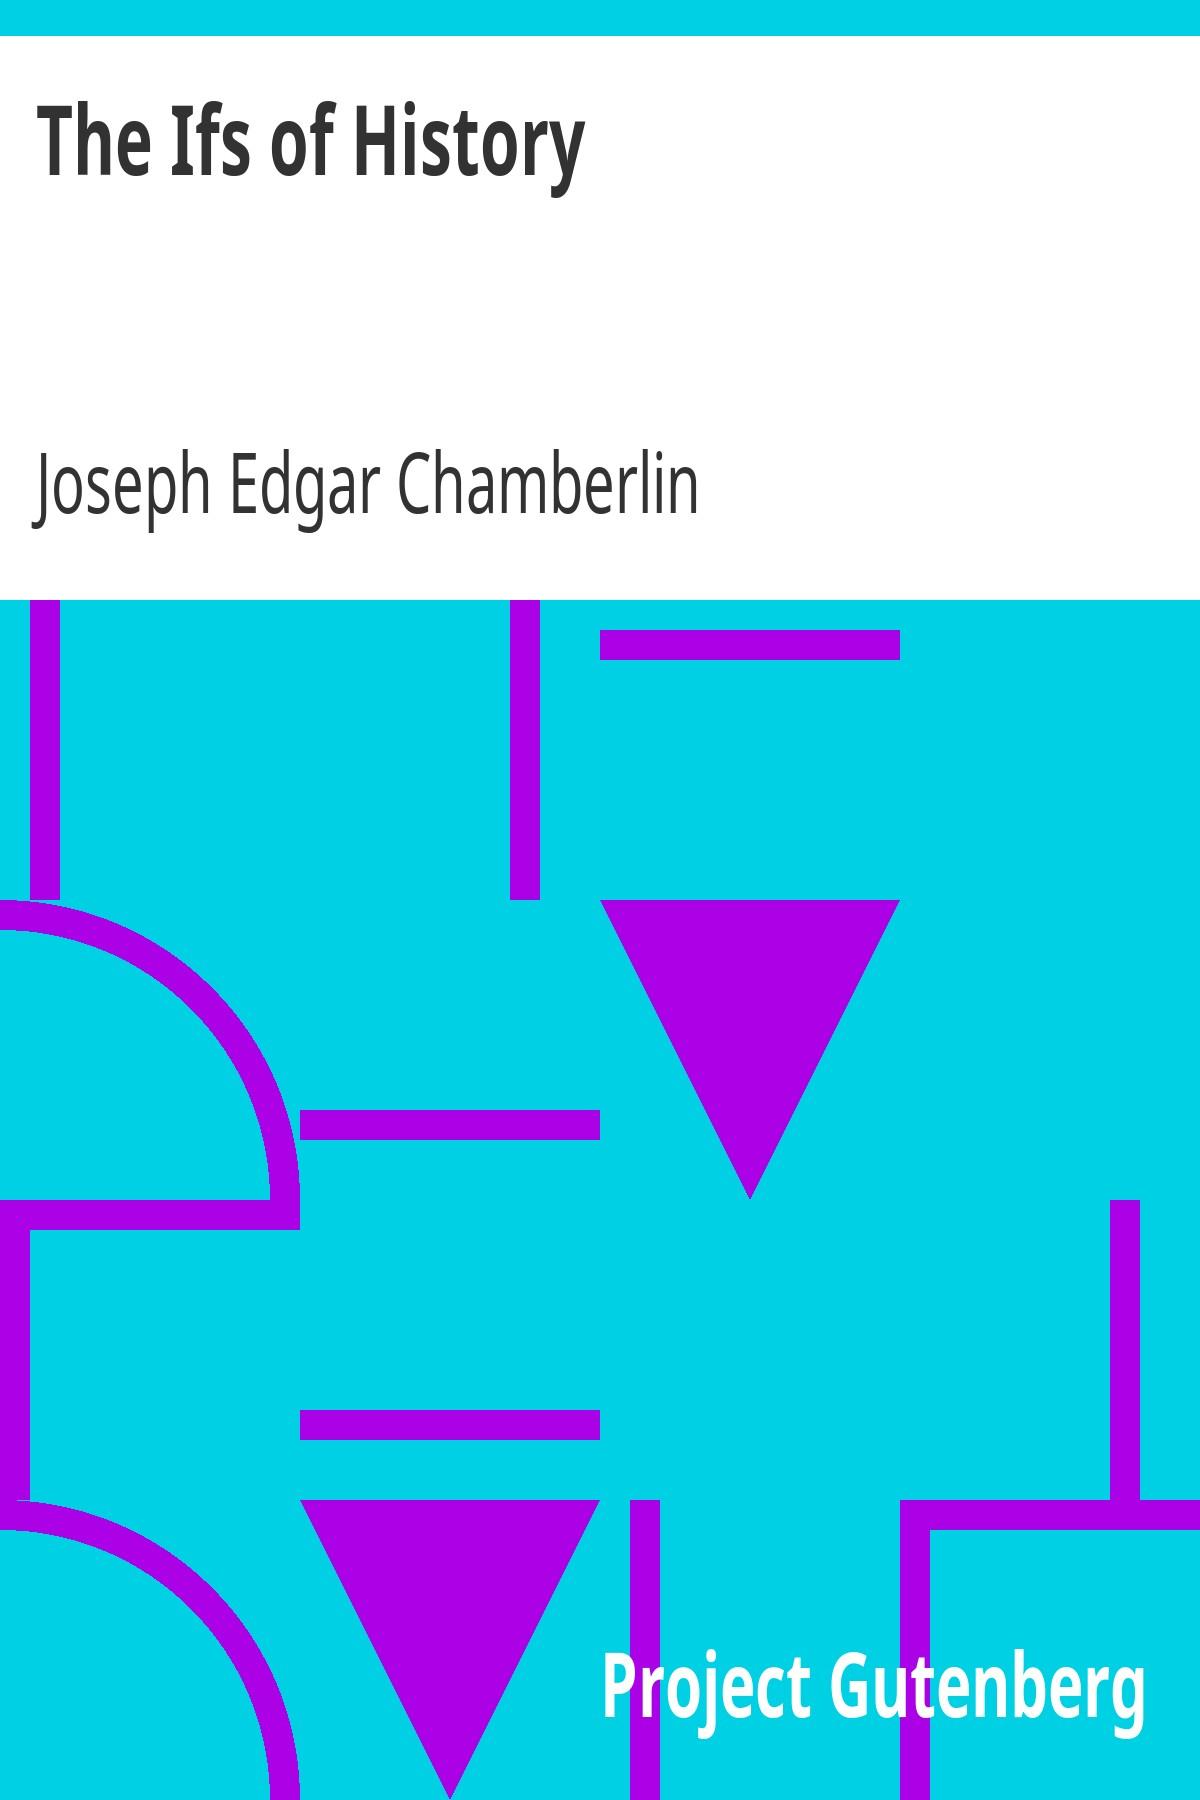 Joseph Edgar Chamberlin The Ifs of History